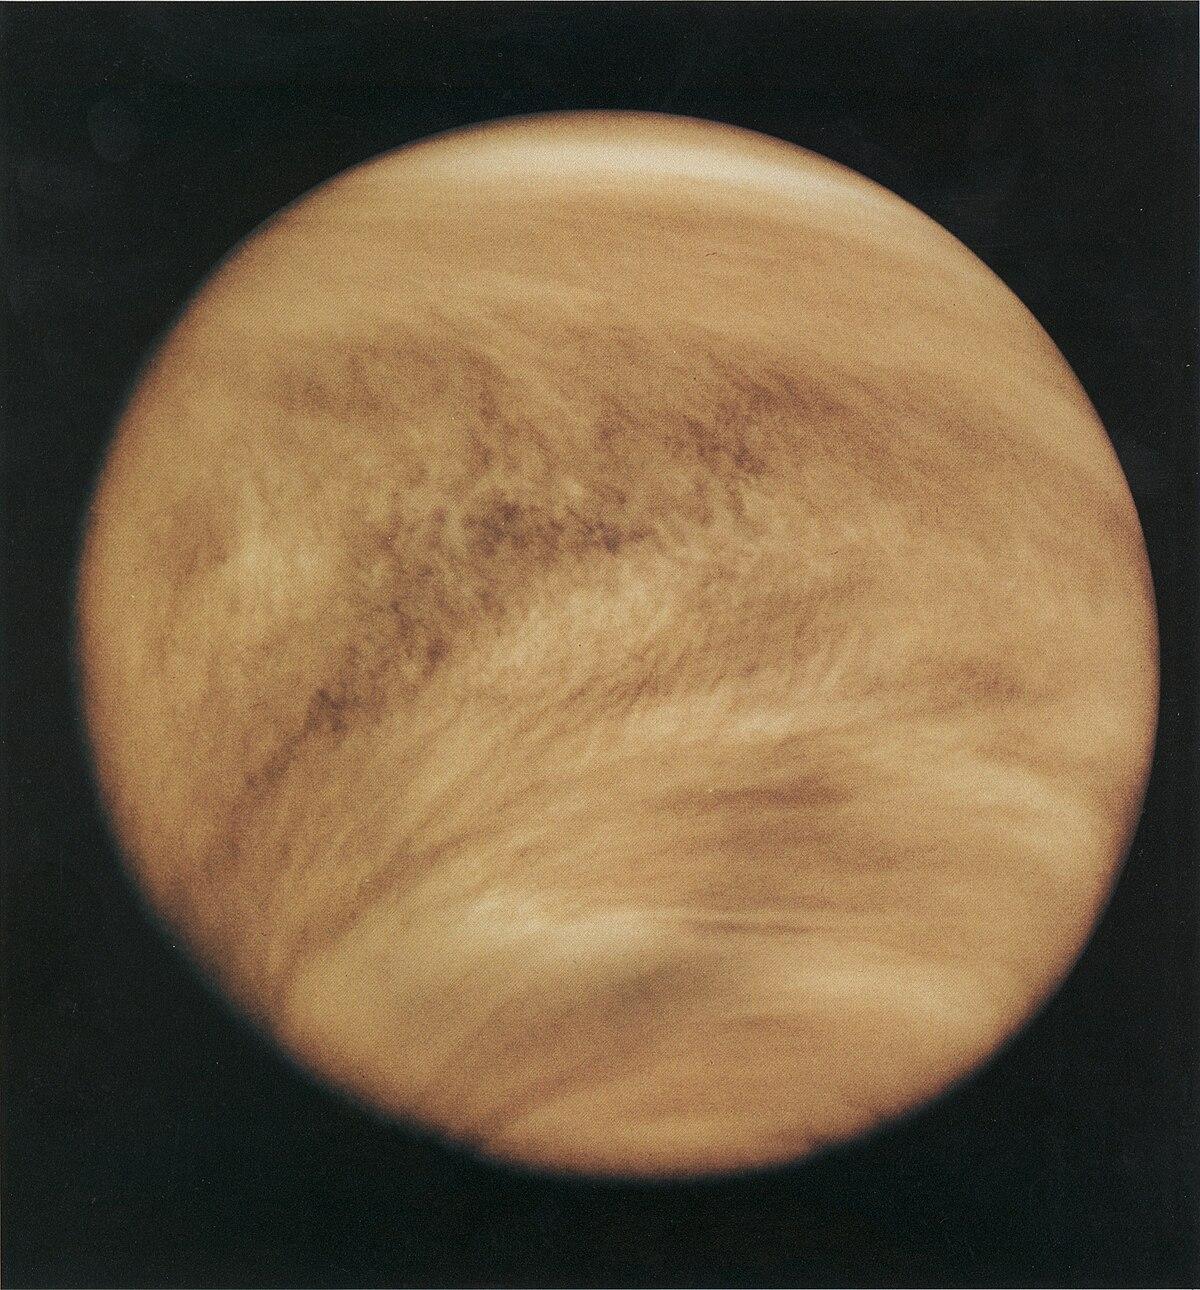 Atmosphere De Venus Wikipedia